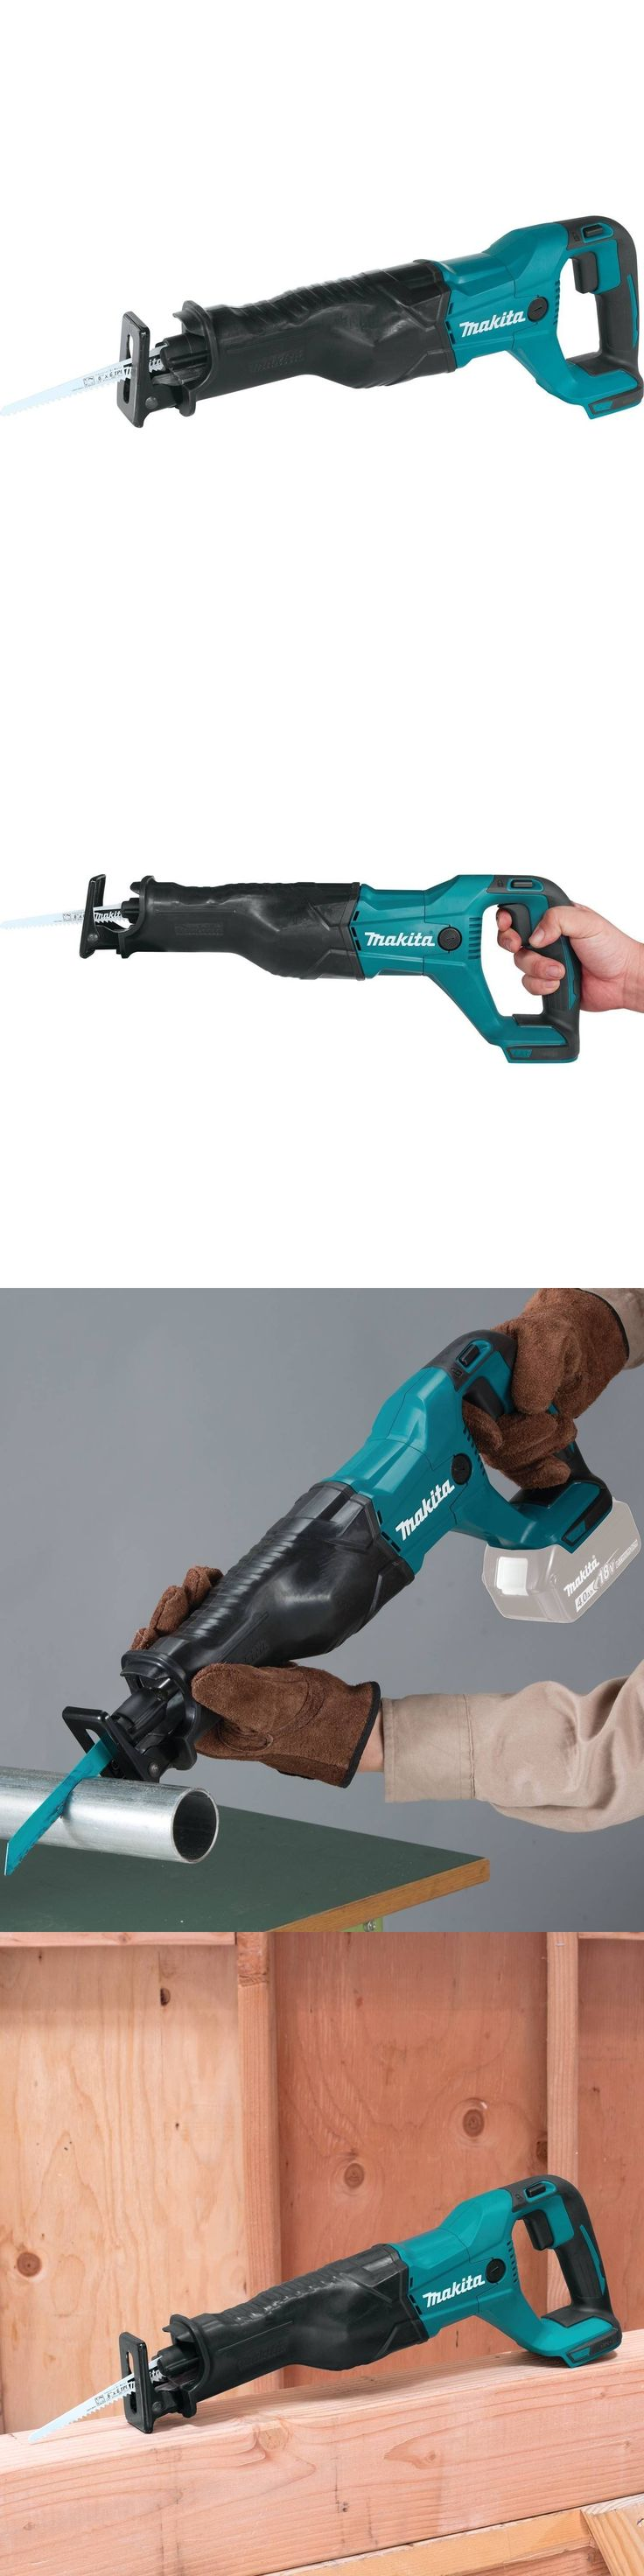 tools: Makita Xrj04z 18V 18 Volt Lithium Ion Cordless Reciprocating Saw Replaces Xrj03z -> BUY IT NOW ONLY: $76.99 on eBay!